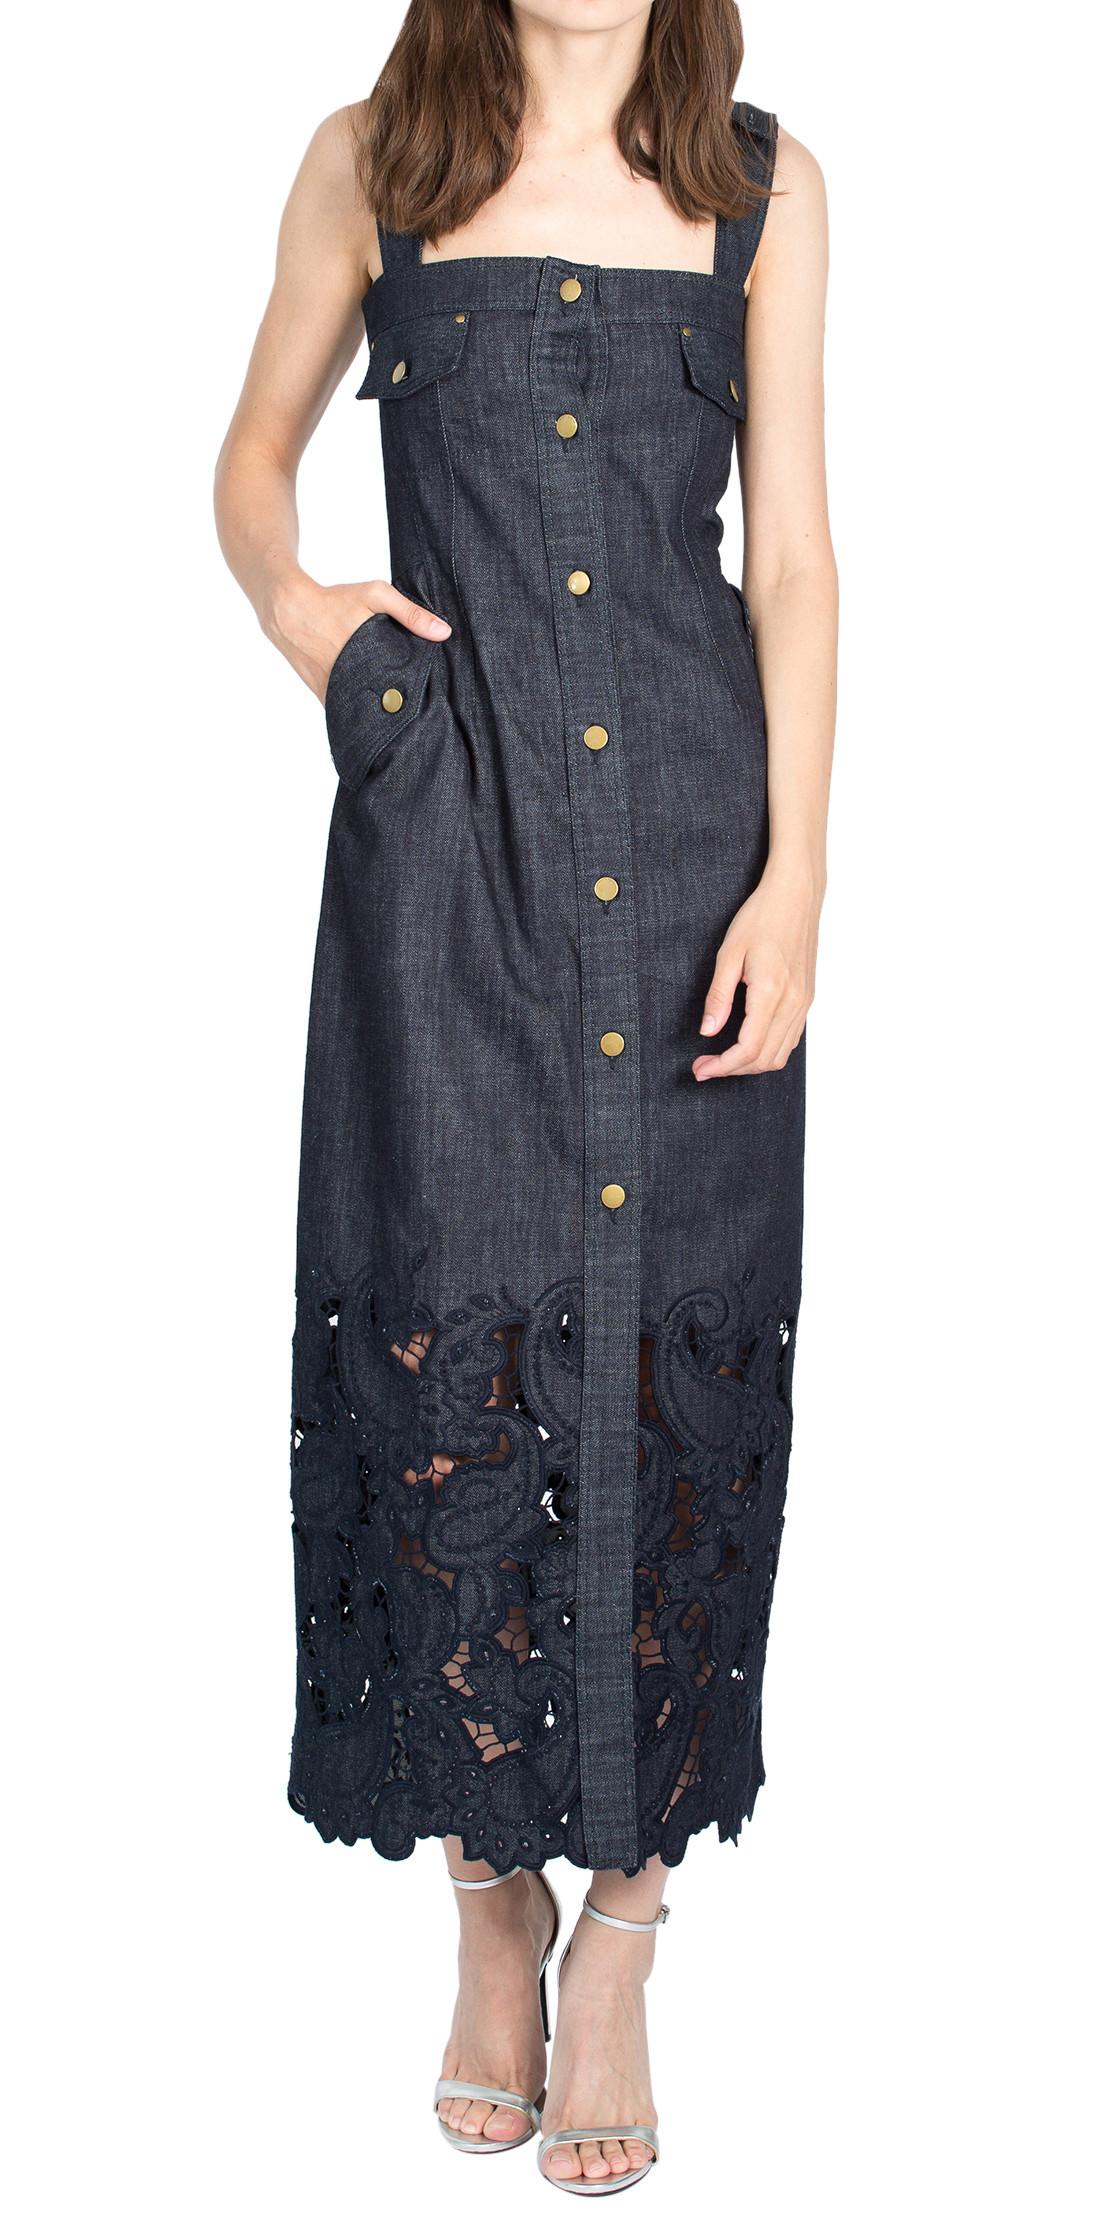 Alberta Ferretti Sleeveless Denim Dress